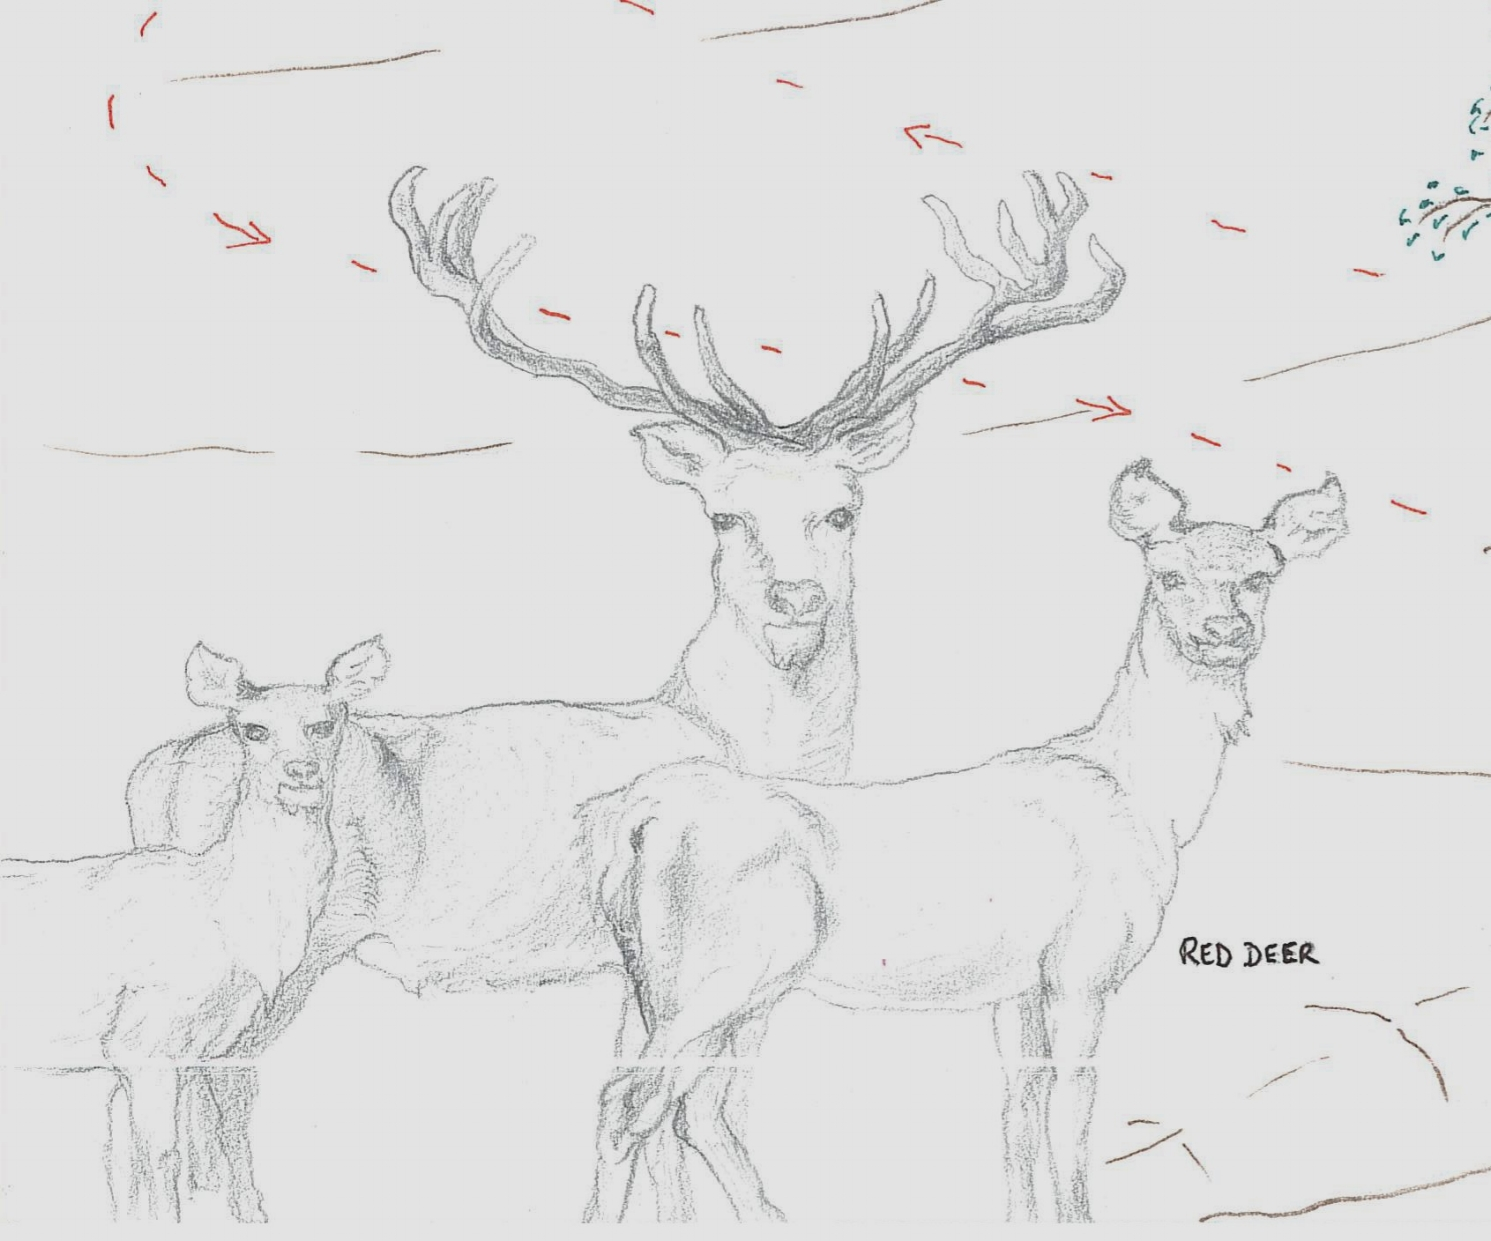 red_deer_at_luxury_villa_rental_ronda_andalusia_spain